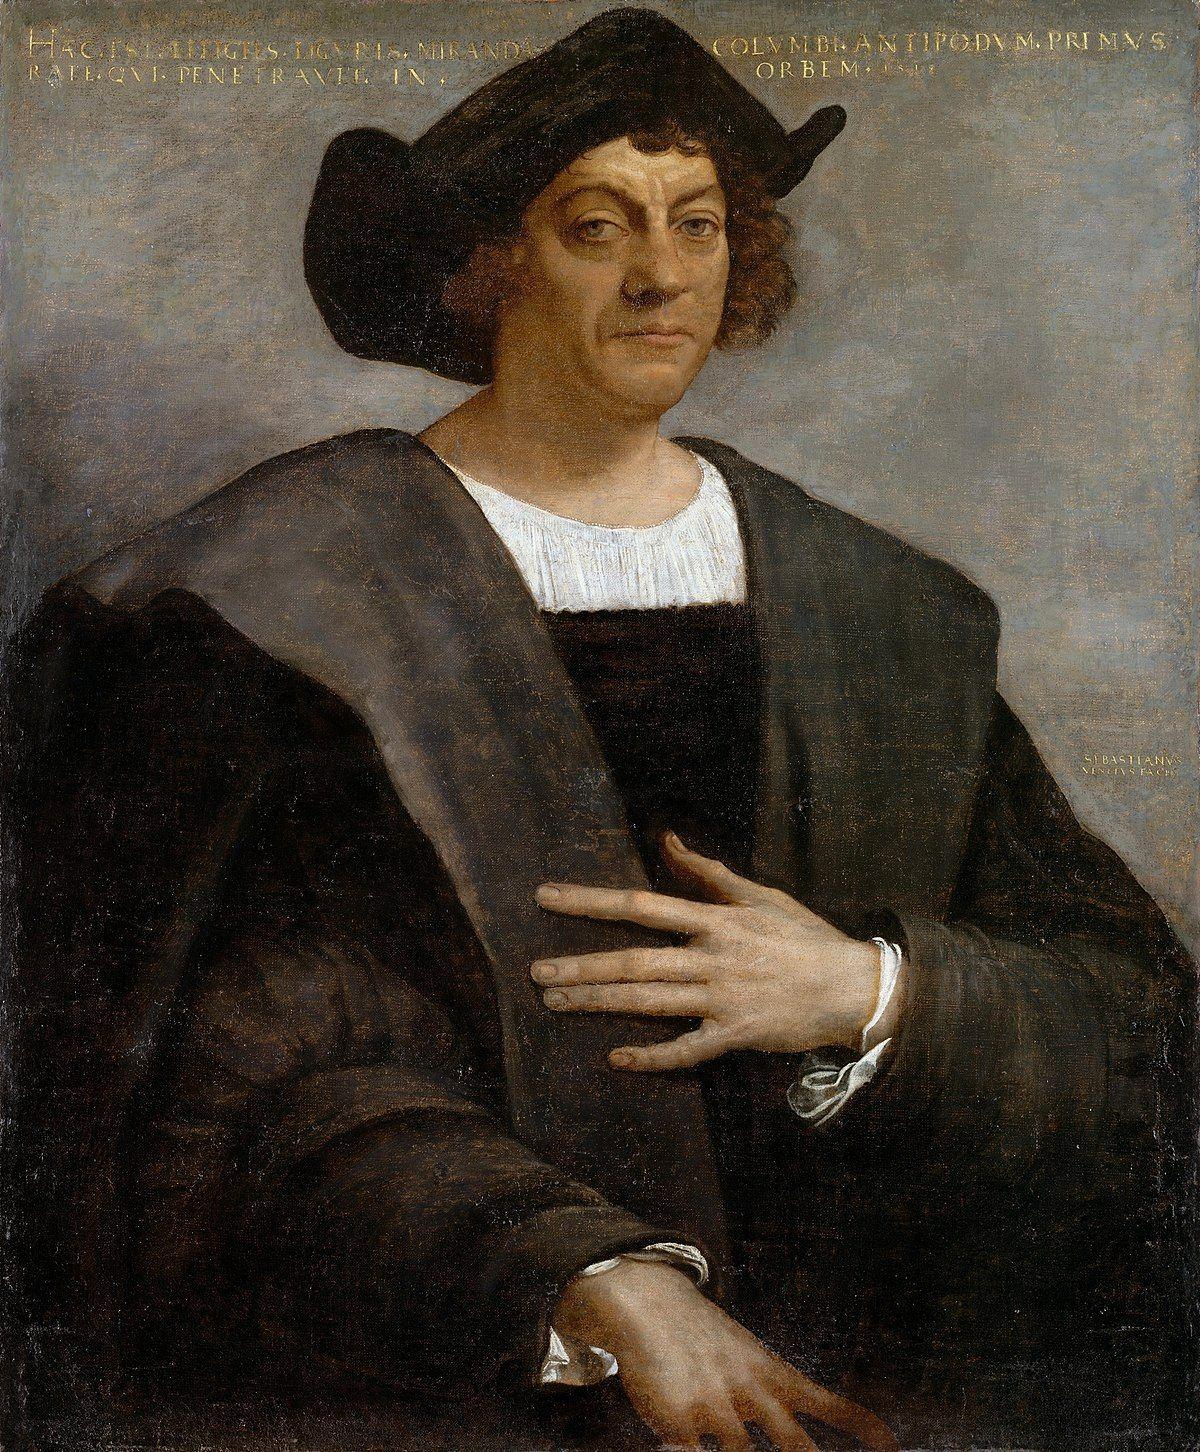 Cristovao Colombo Wikipedia A Enciclopedia Livre